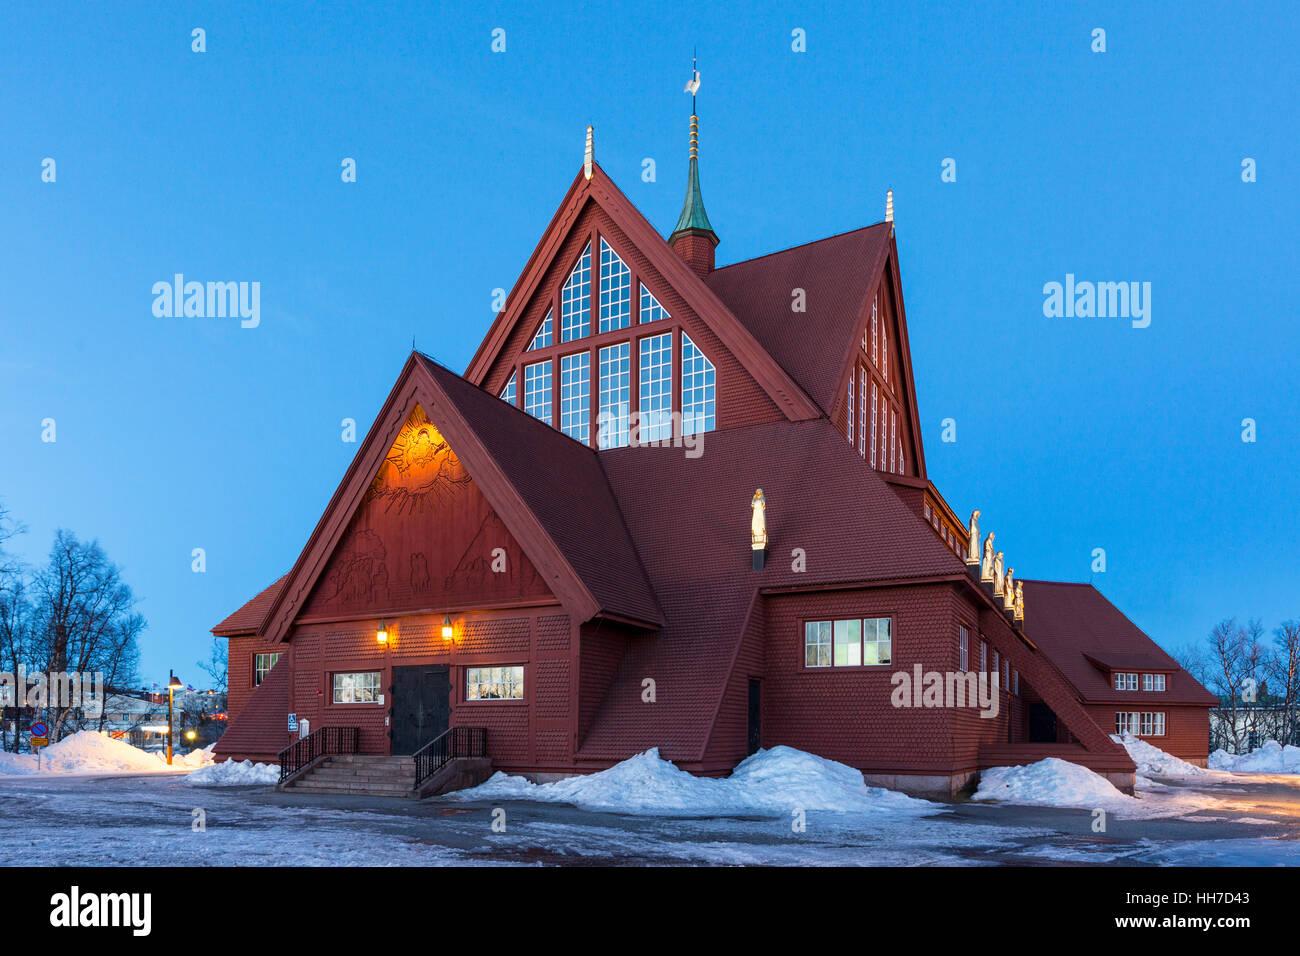 Kiruna Church, Kiruna kyrka, Lapland, Northern Sweden, Sweden - Stock Image